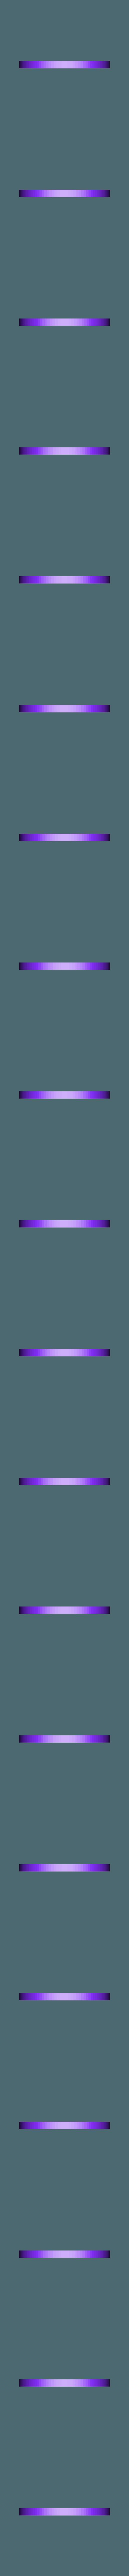 Mount_Planter_Part_1.stl Download free STL file Levitating Planter • 3D print design, Ananords